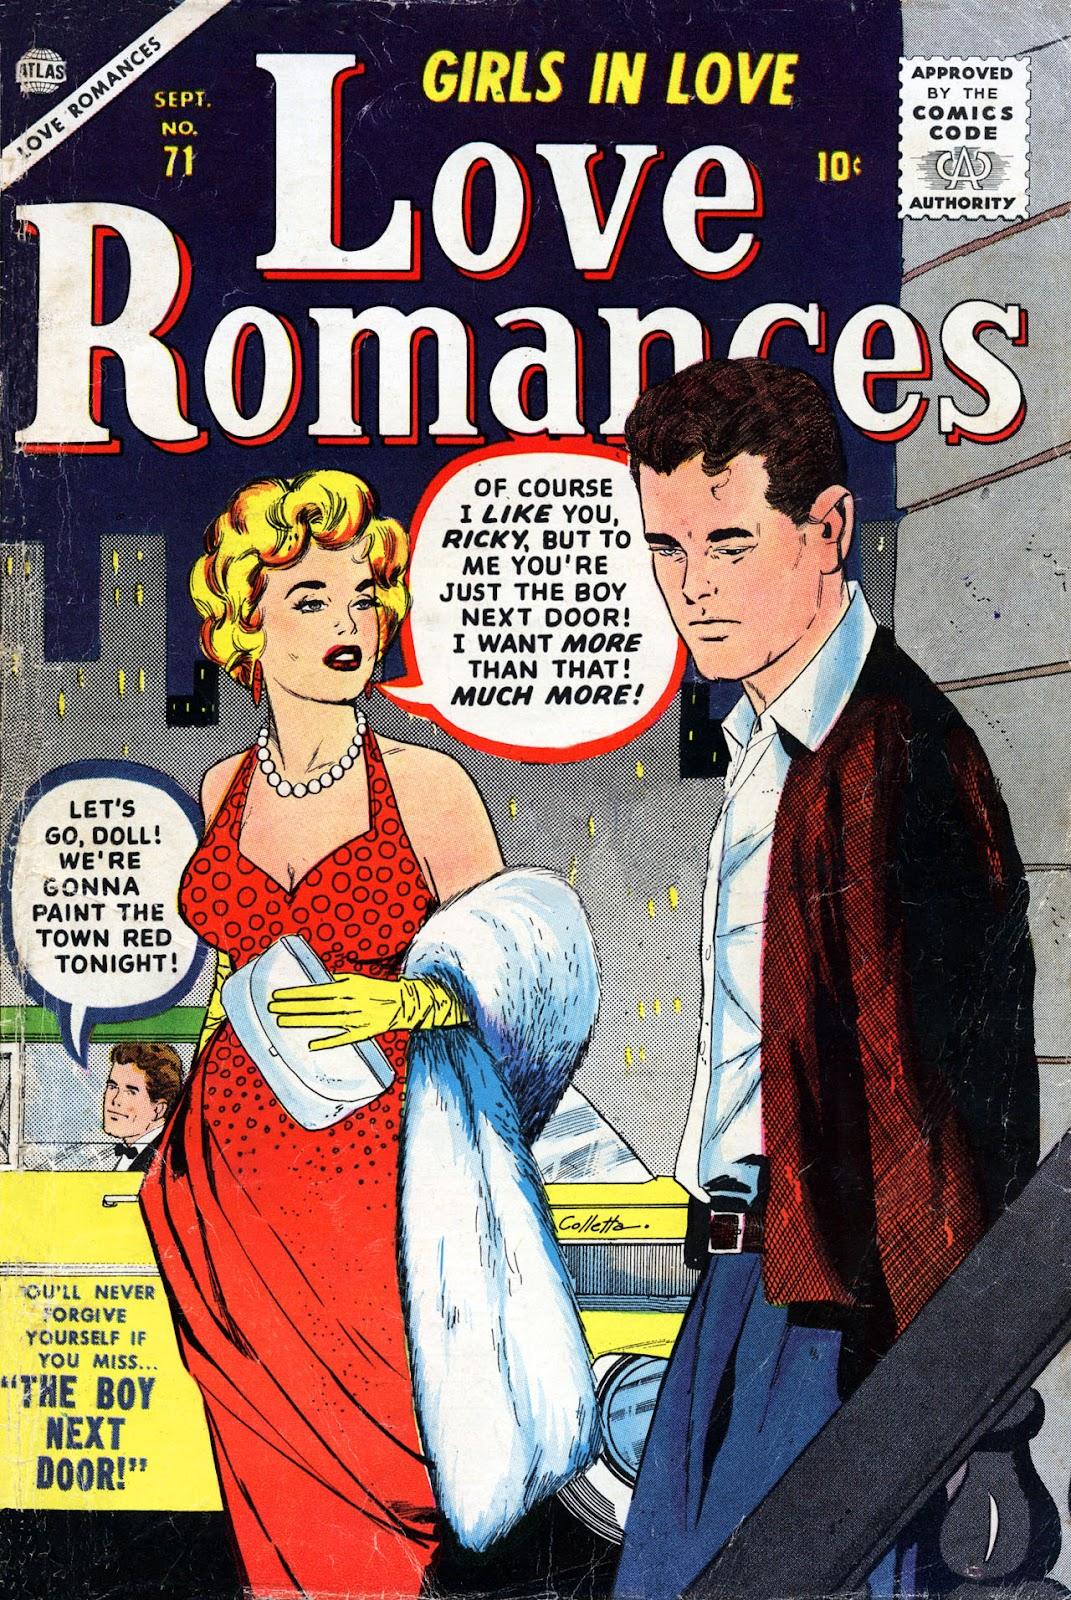 Love Romances (1949) issue 71 - Page 1